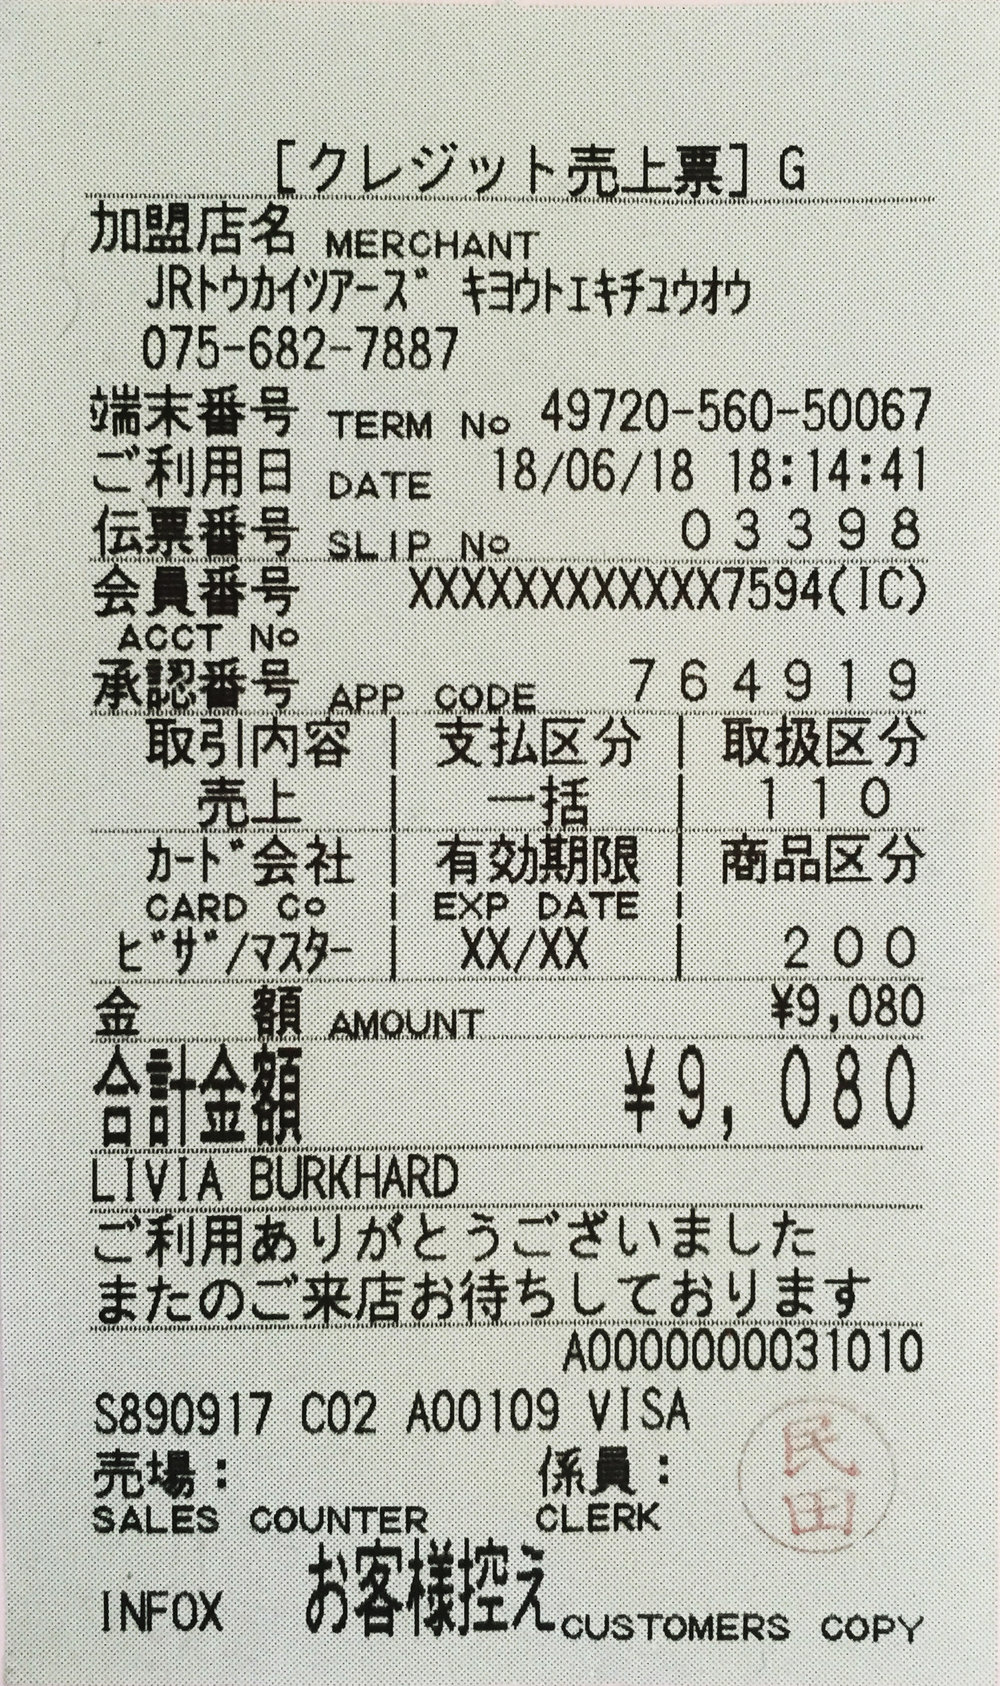 Foto 04.07.18, 19 24 23.jpg